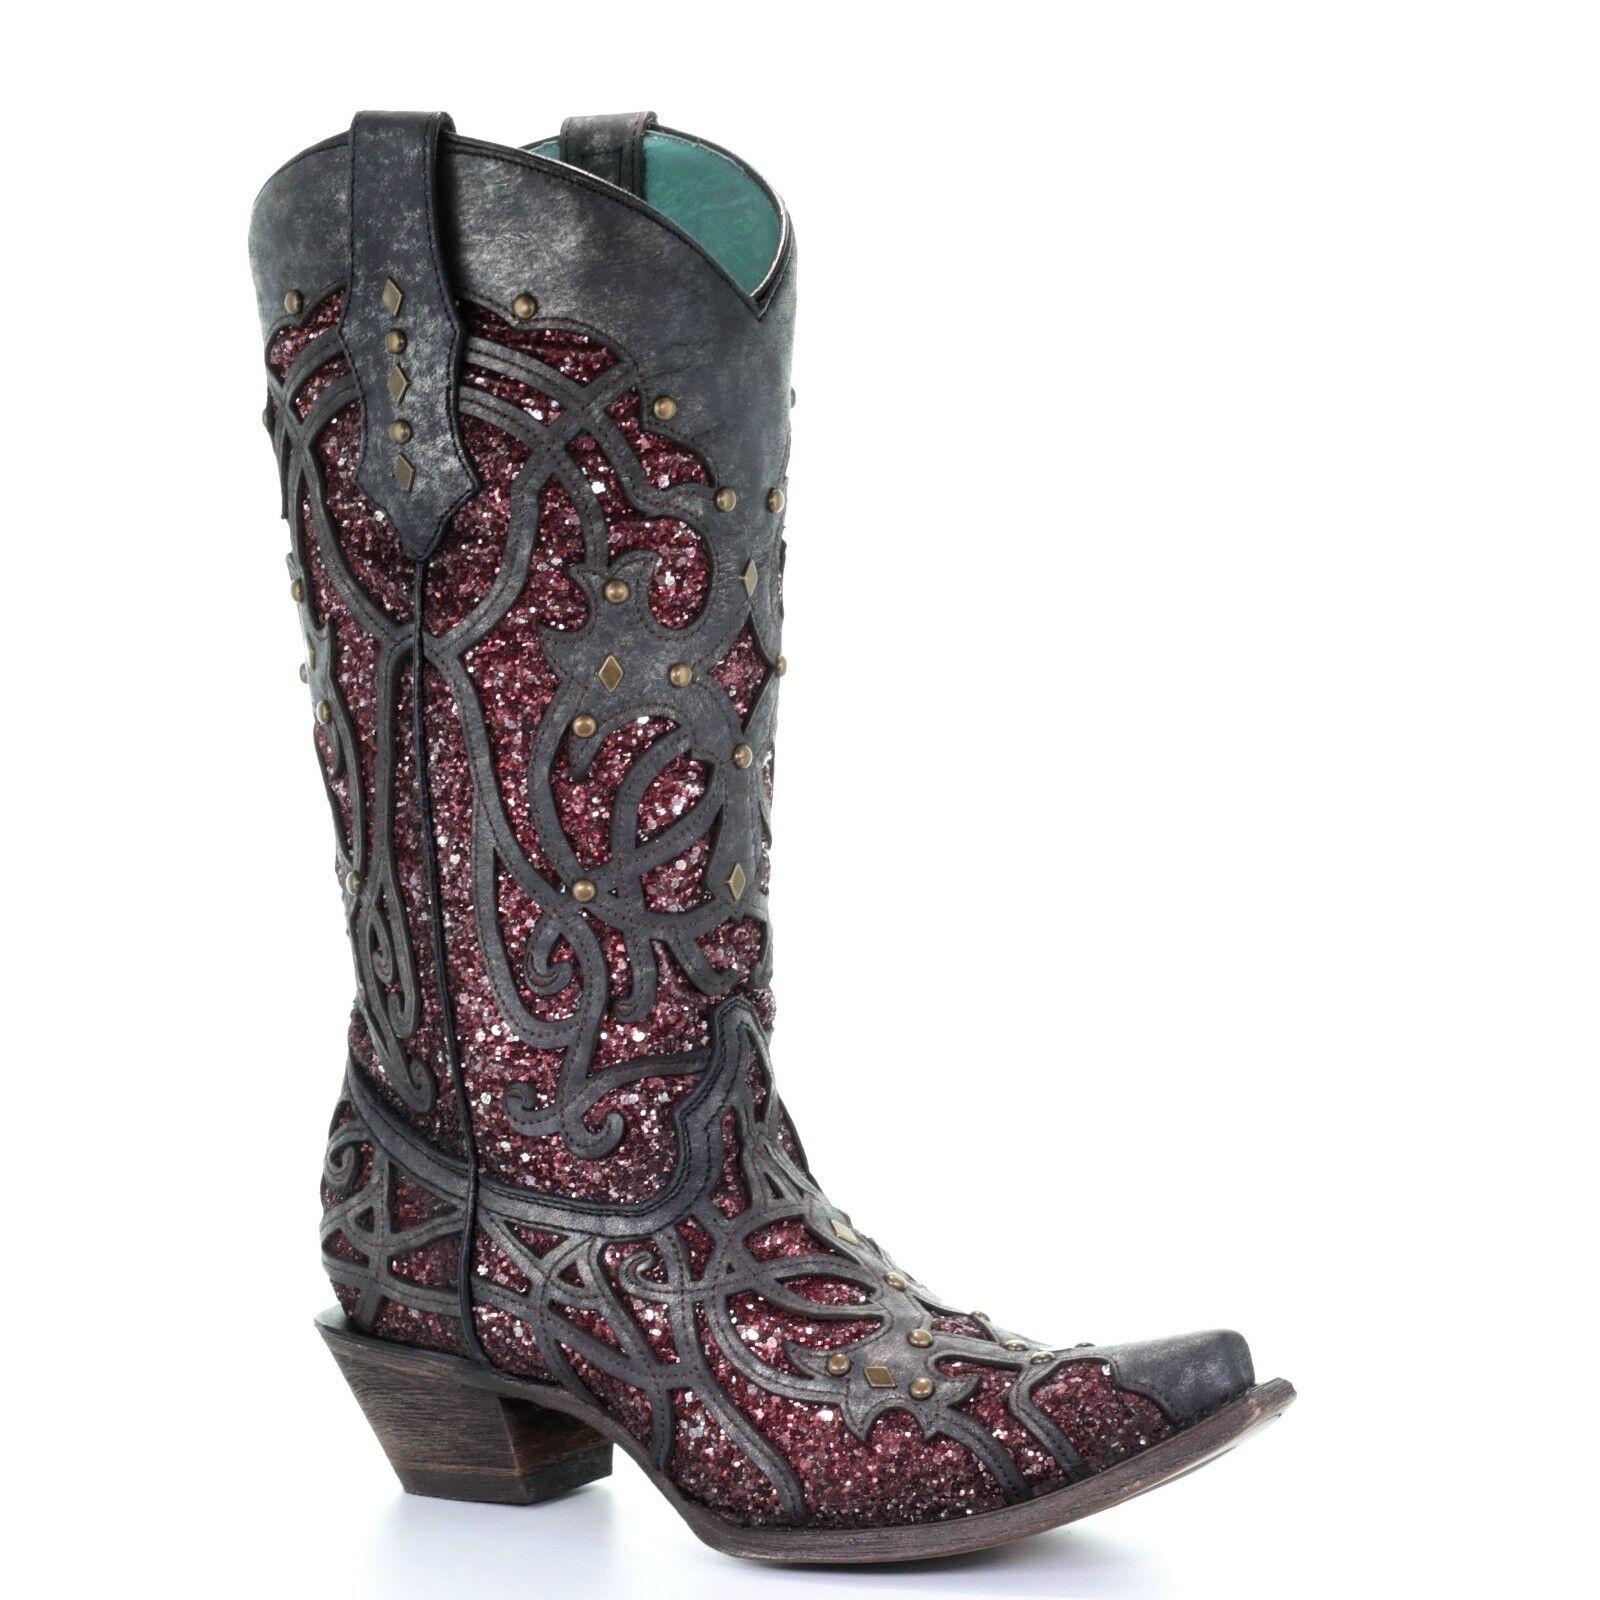 Corral Ladies Black & Purple Glitter Inlay & Studs Boots C3406